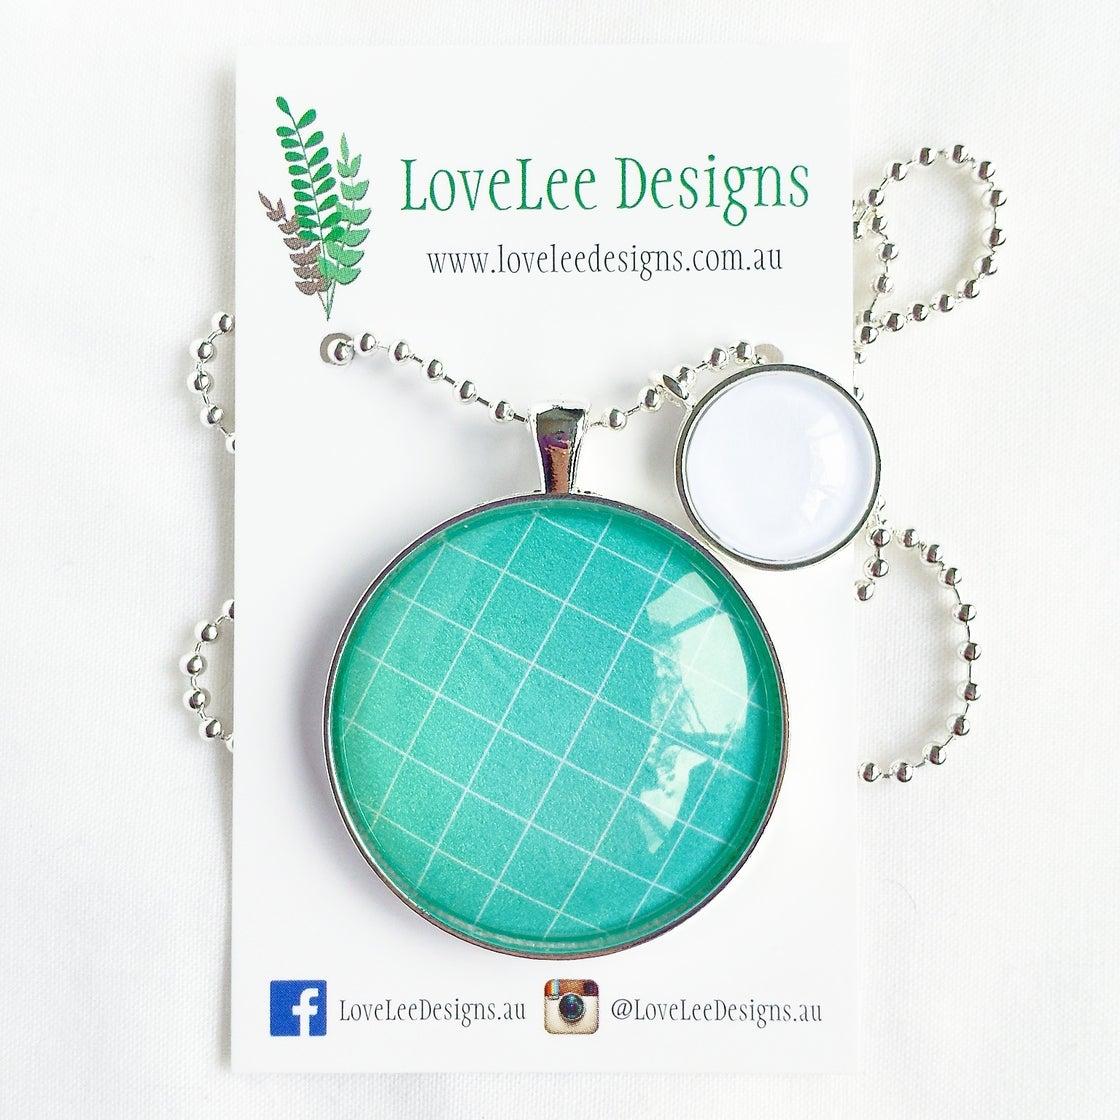 Image of 1.5inch pendant - sea green grid